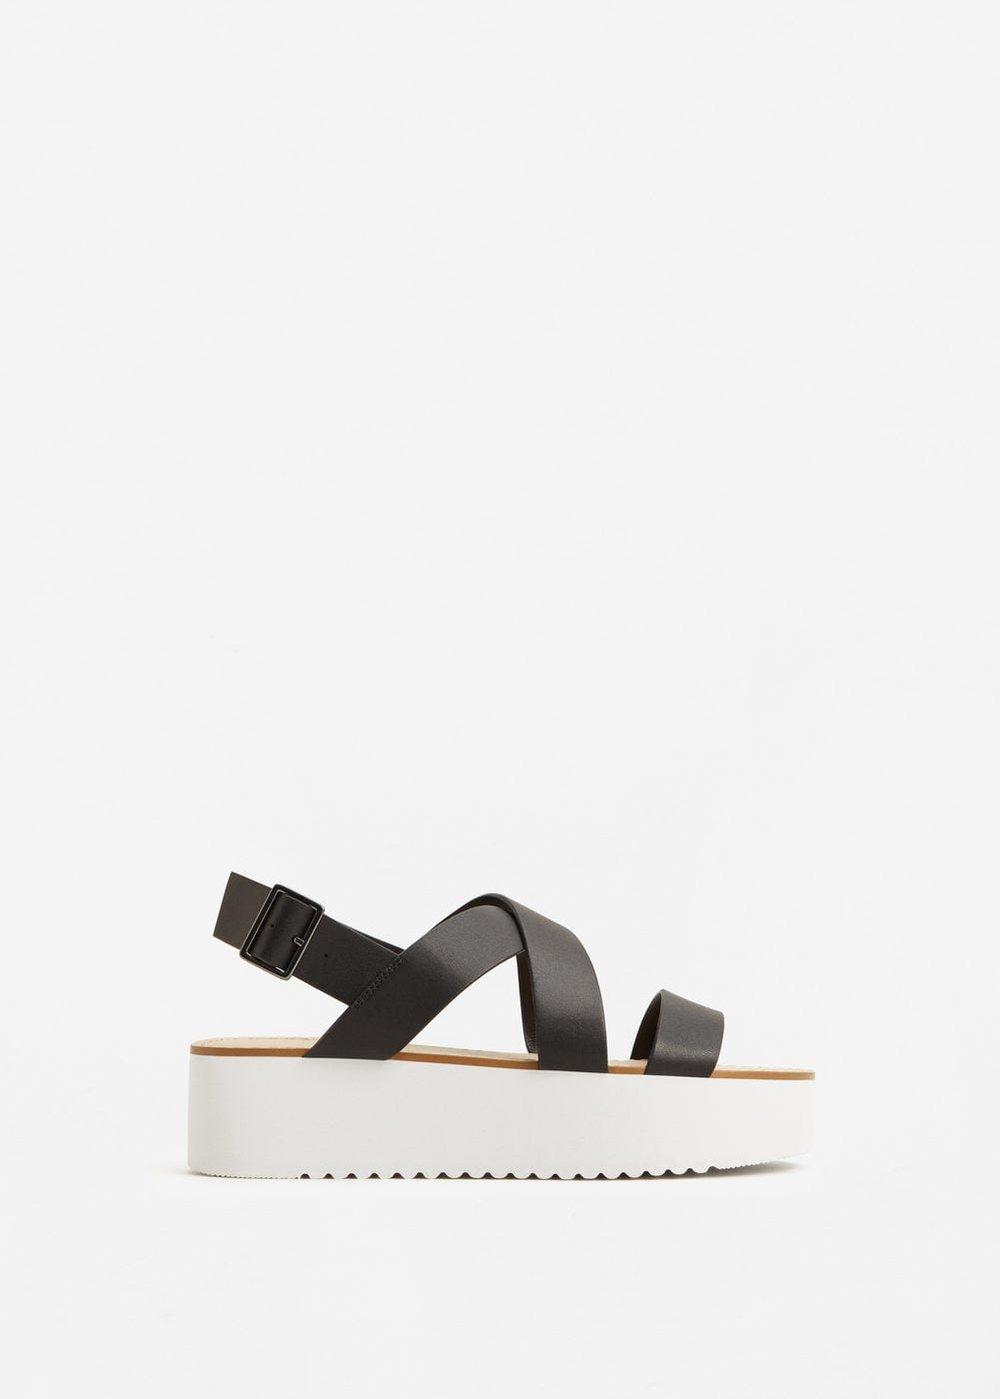 Mango Platform sandals $59.99